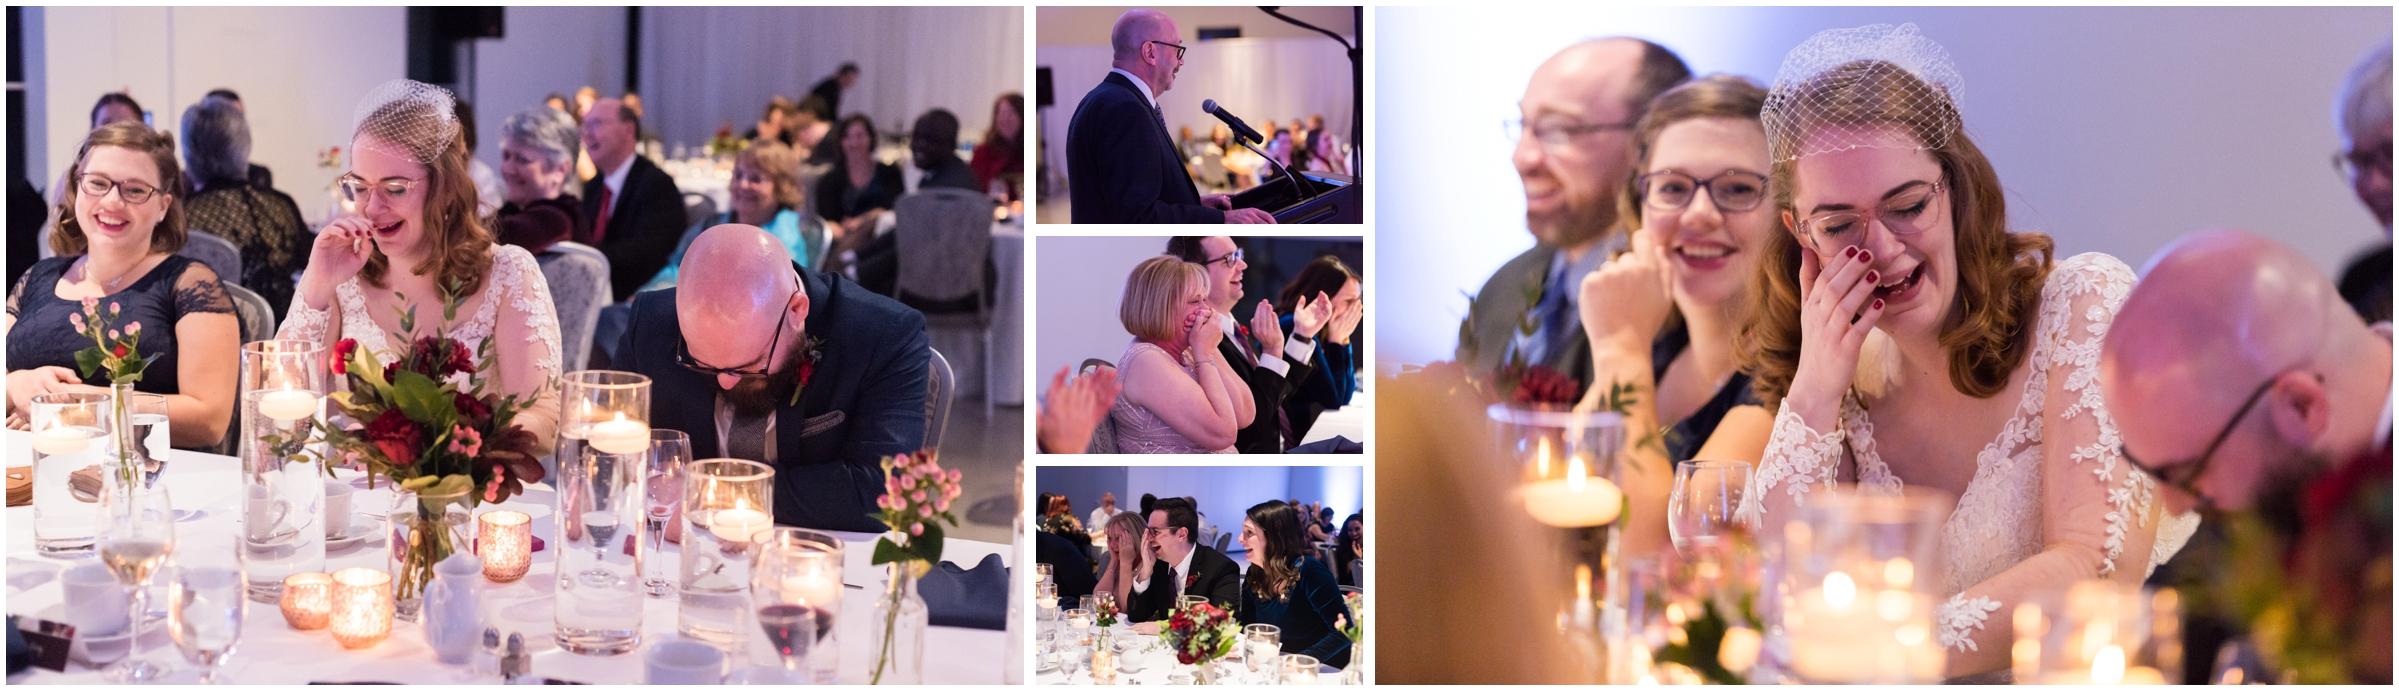 Ottaw Wedding Allison Andrew - (Selena Phillips-Boyle)_0088.jpg